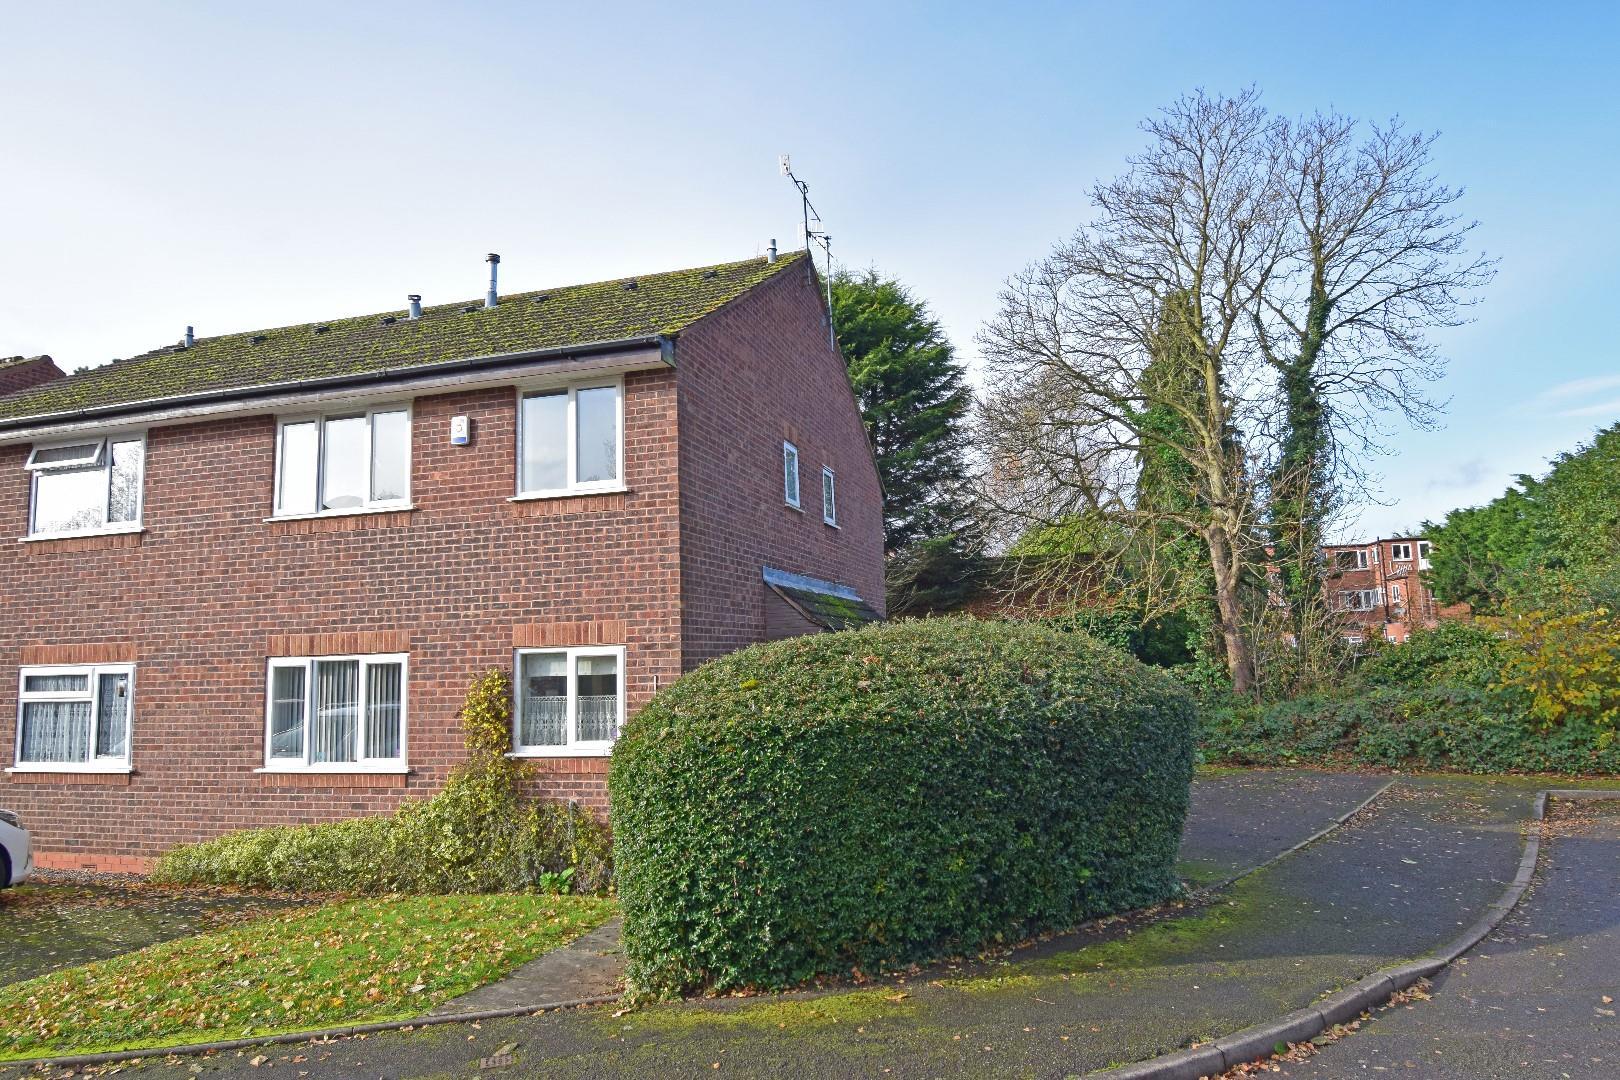 23 Oakhurst Drive, Bromsgrove, Worcestershire, B60 1AR